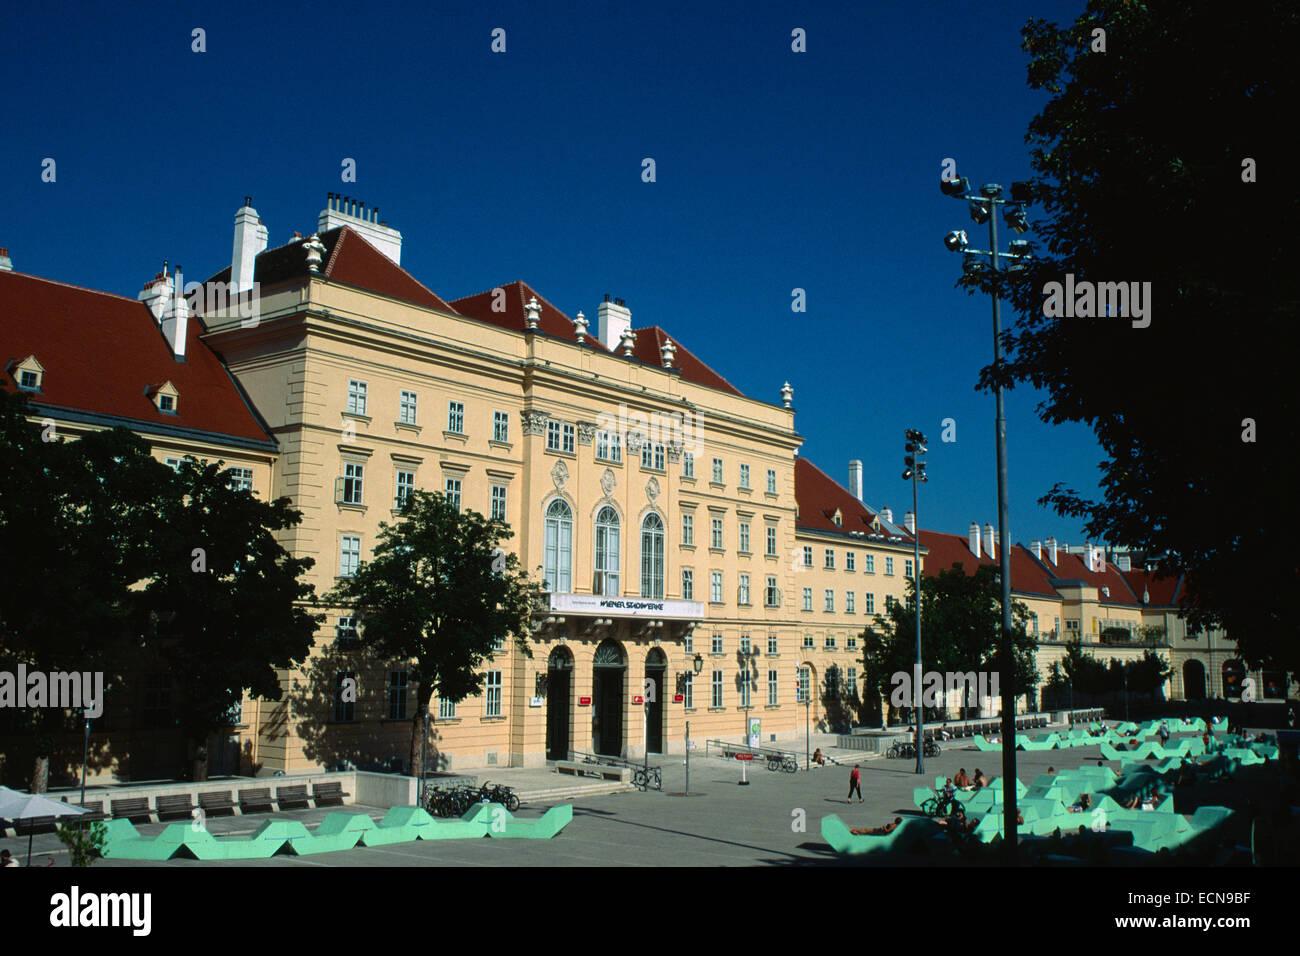 Austria, Vienna, Museum Quartier - Stock Image